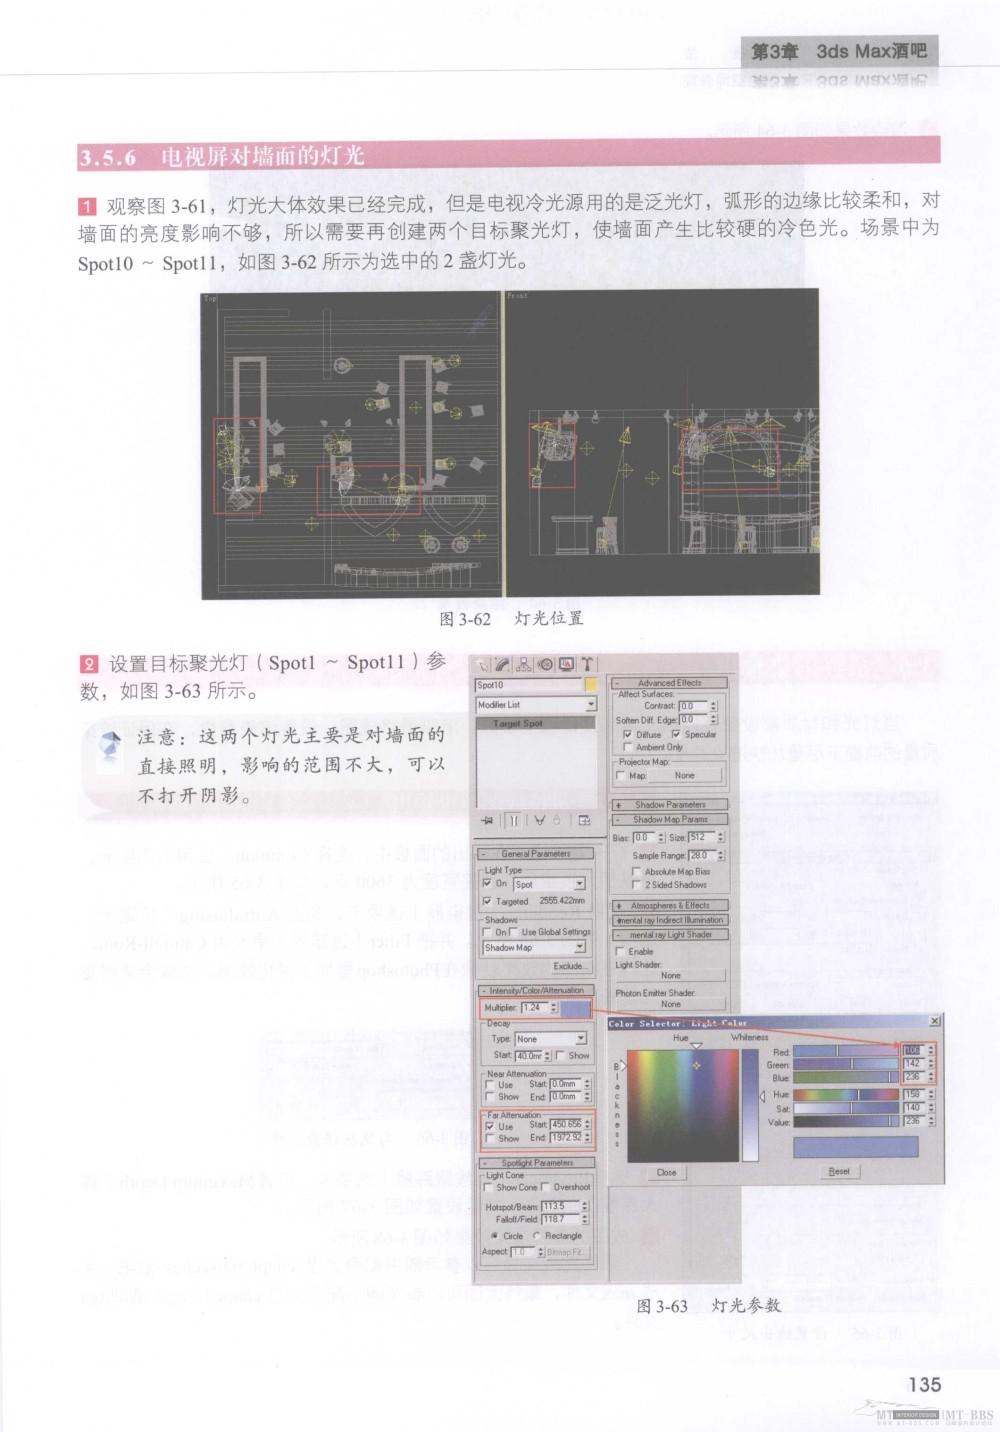 水晶石技法-3ds_Max&VRay室内空间表现_水晶石技法-3ds_Max&VRay室内空间表现_页面_141.jpg